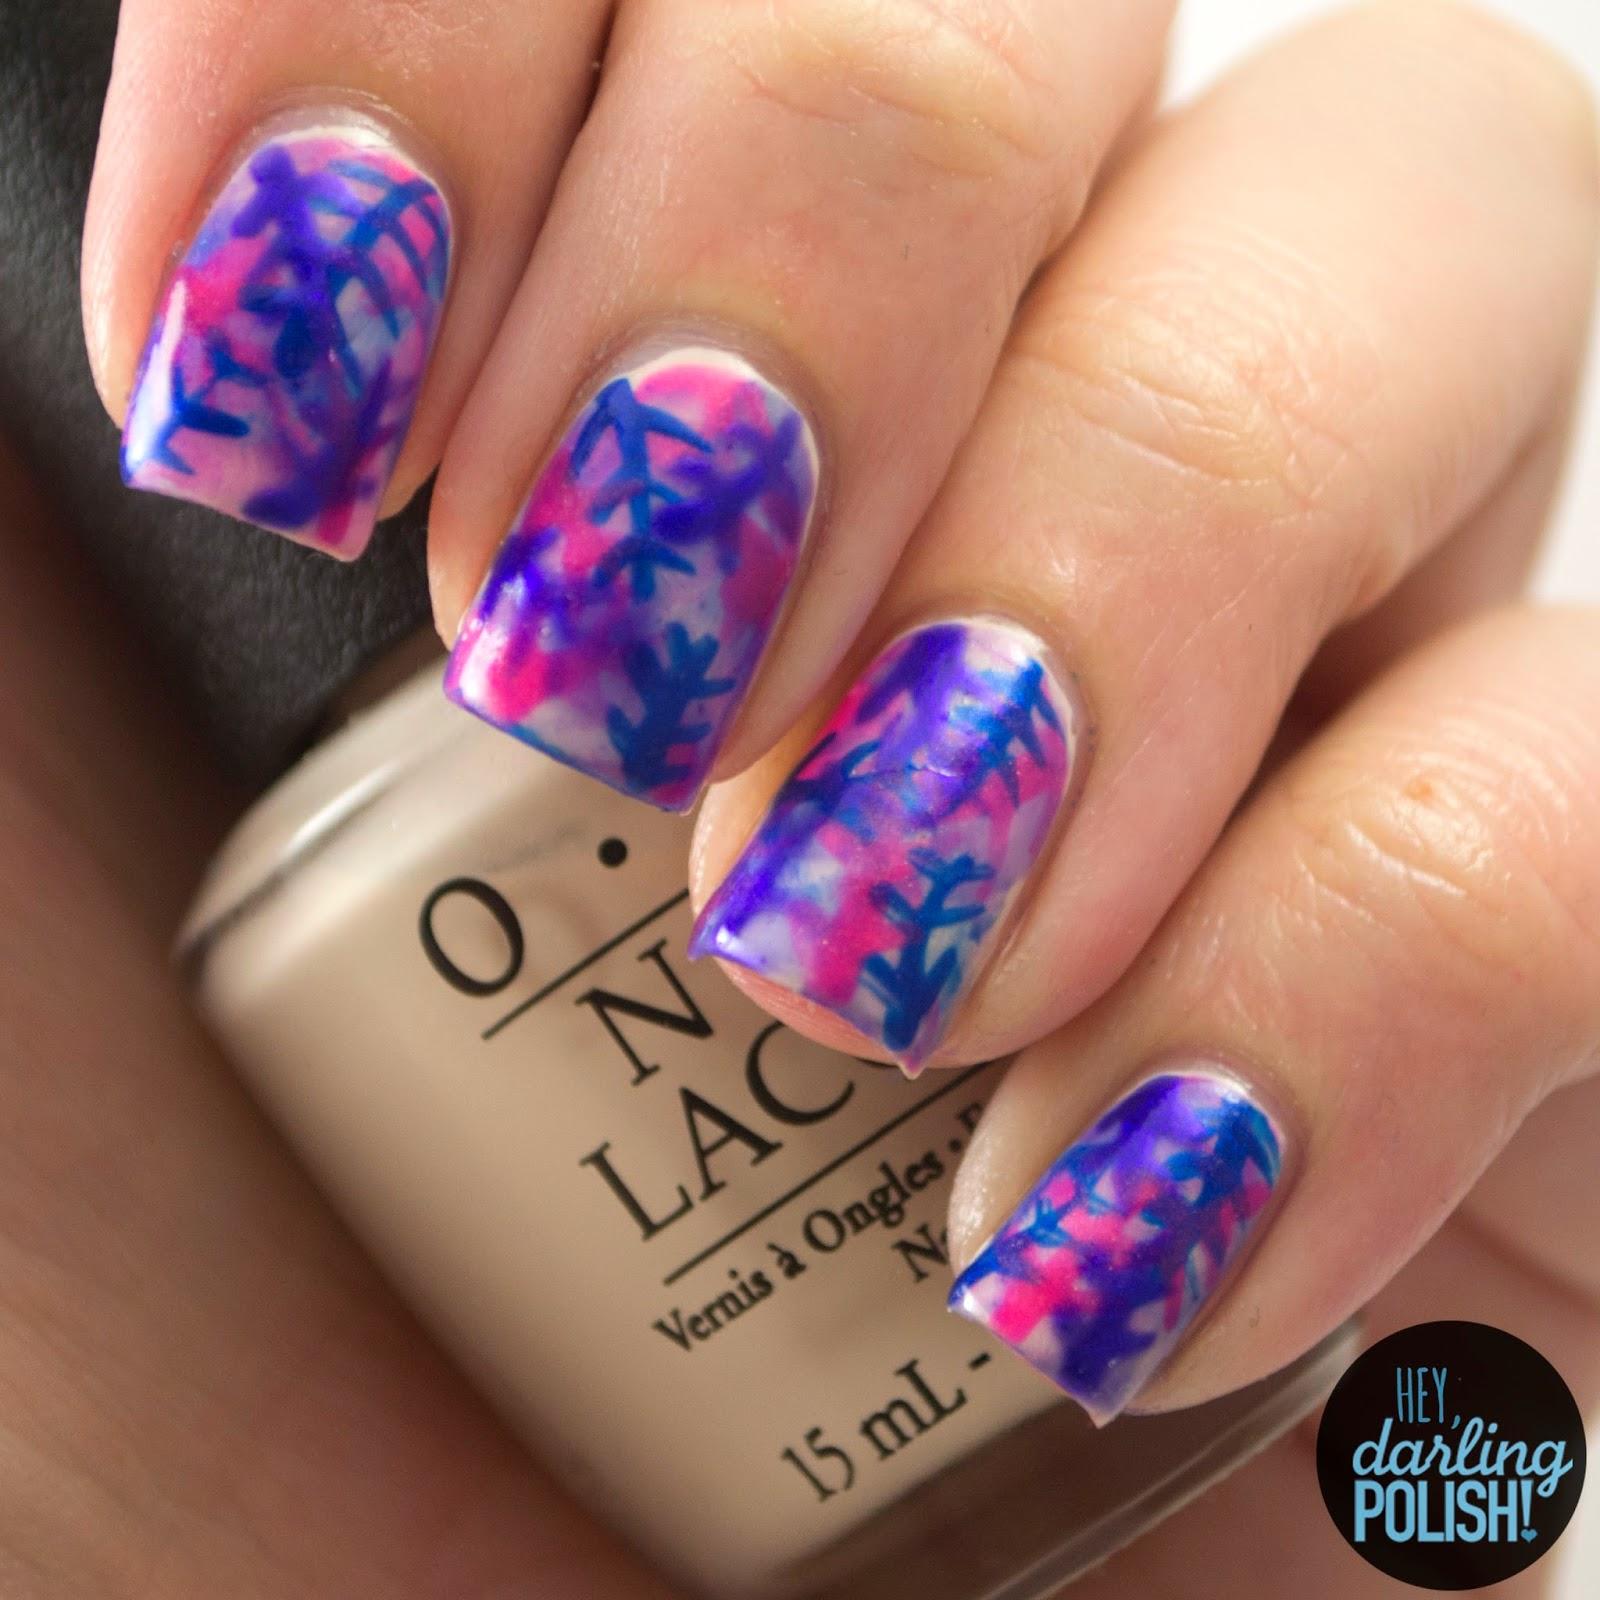 nails, nail art, nail polish, polish, golden oldie thursdays, tropical, pink, blue, purple, hey darling polish